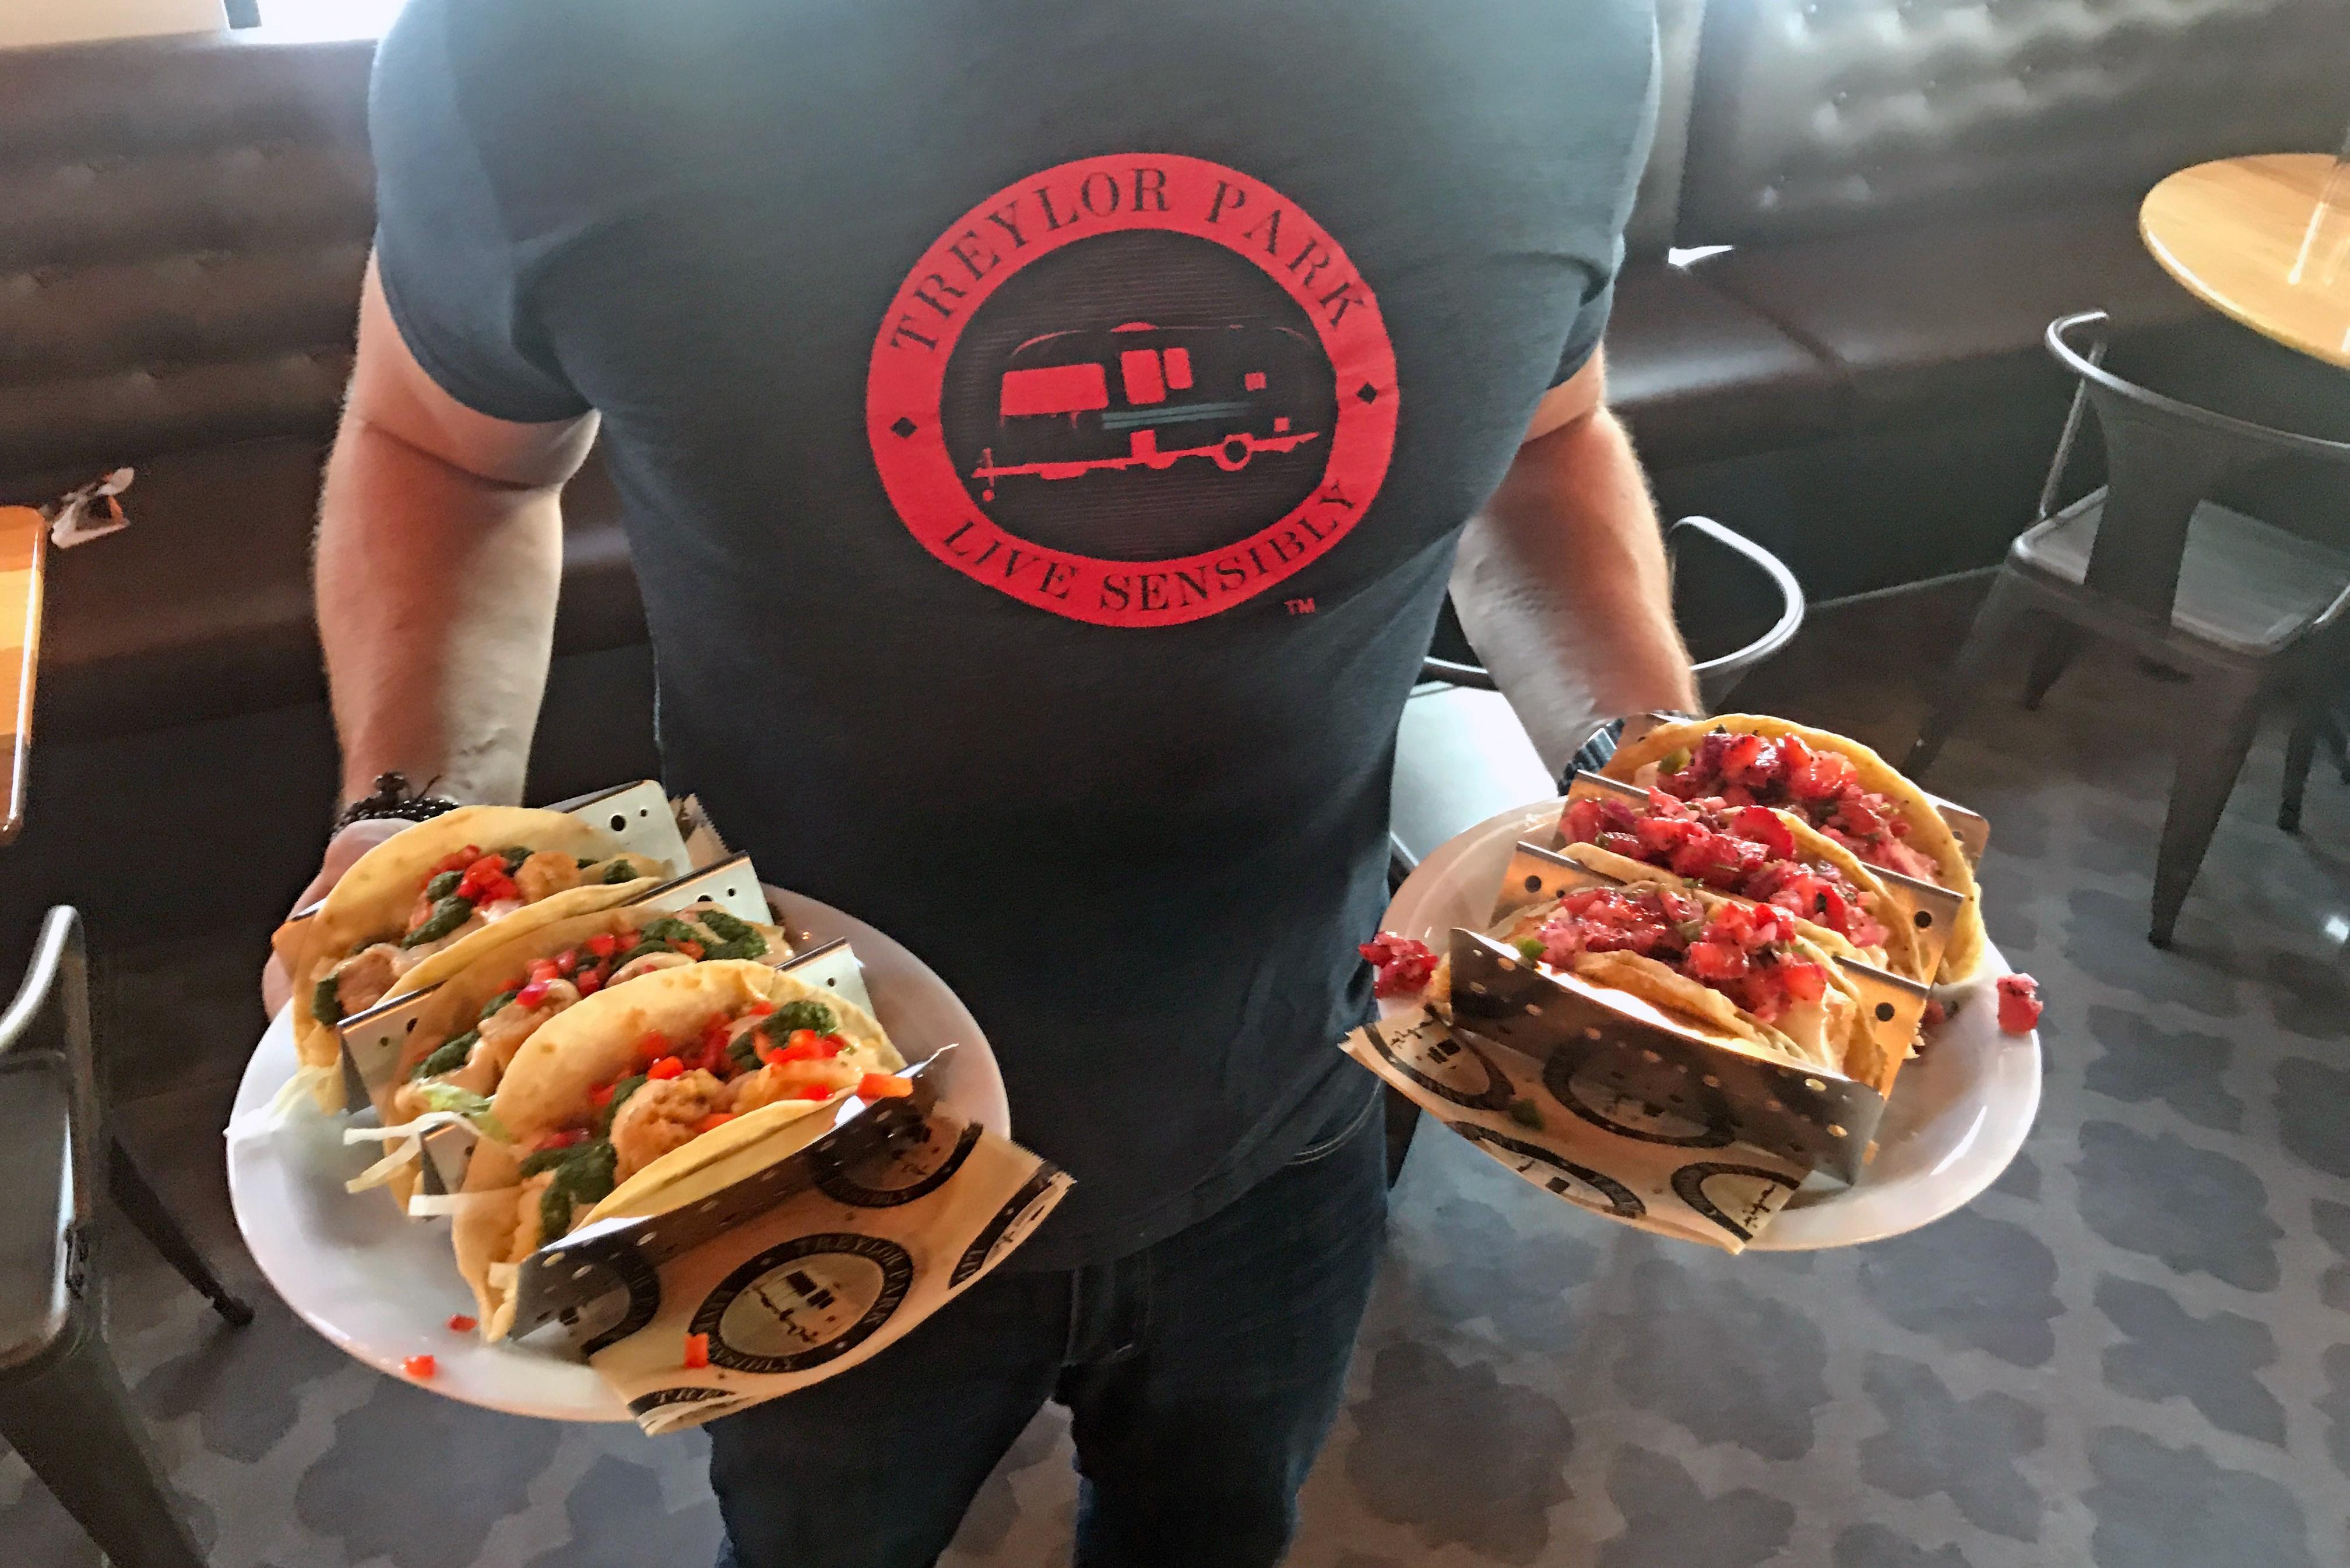 TreylorPark-tacos